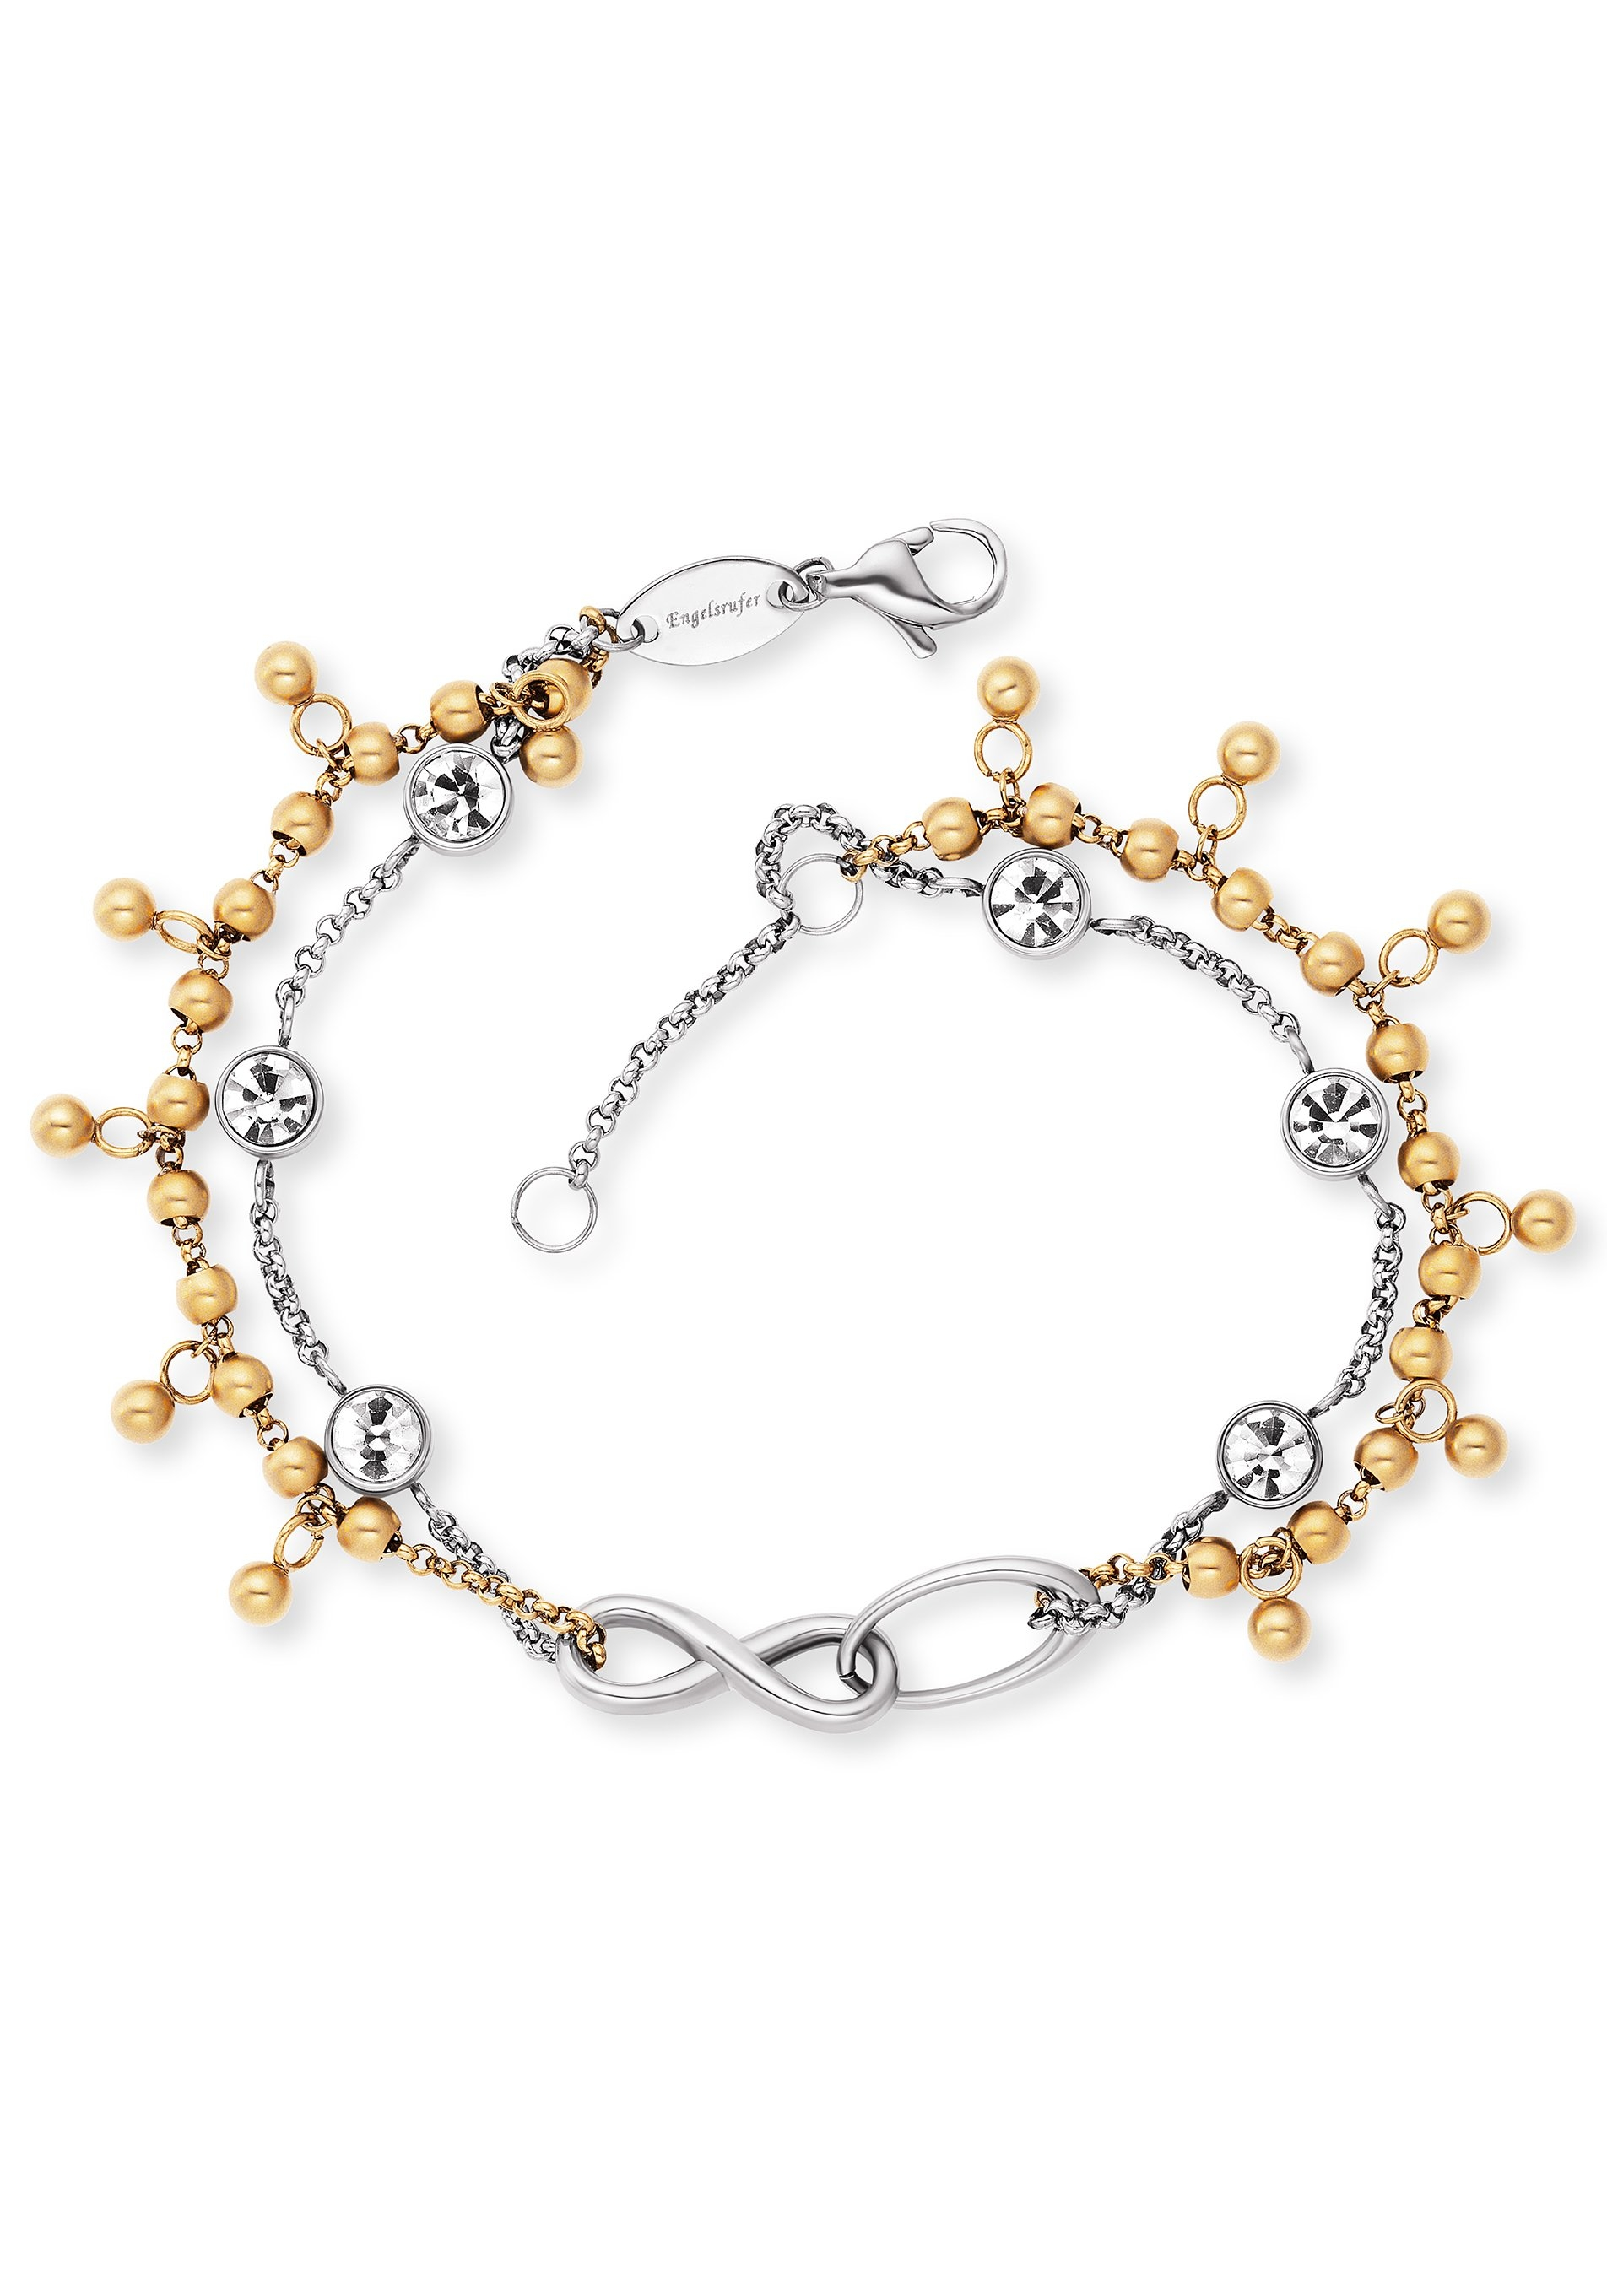 Engelsrufer Edelstalen armband BOHO Infinity, ERBS-INFINITY-ZI-bi met zirkoon online kopen op otto.nl